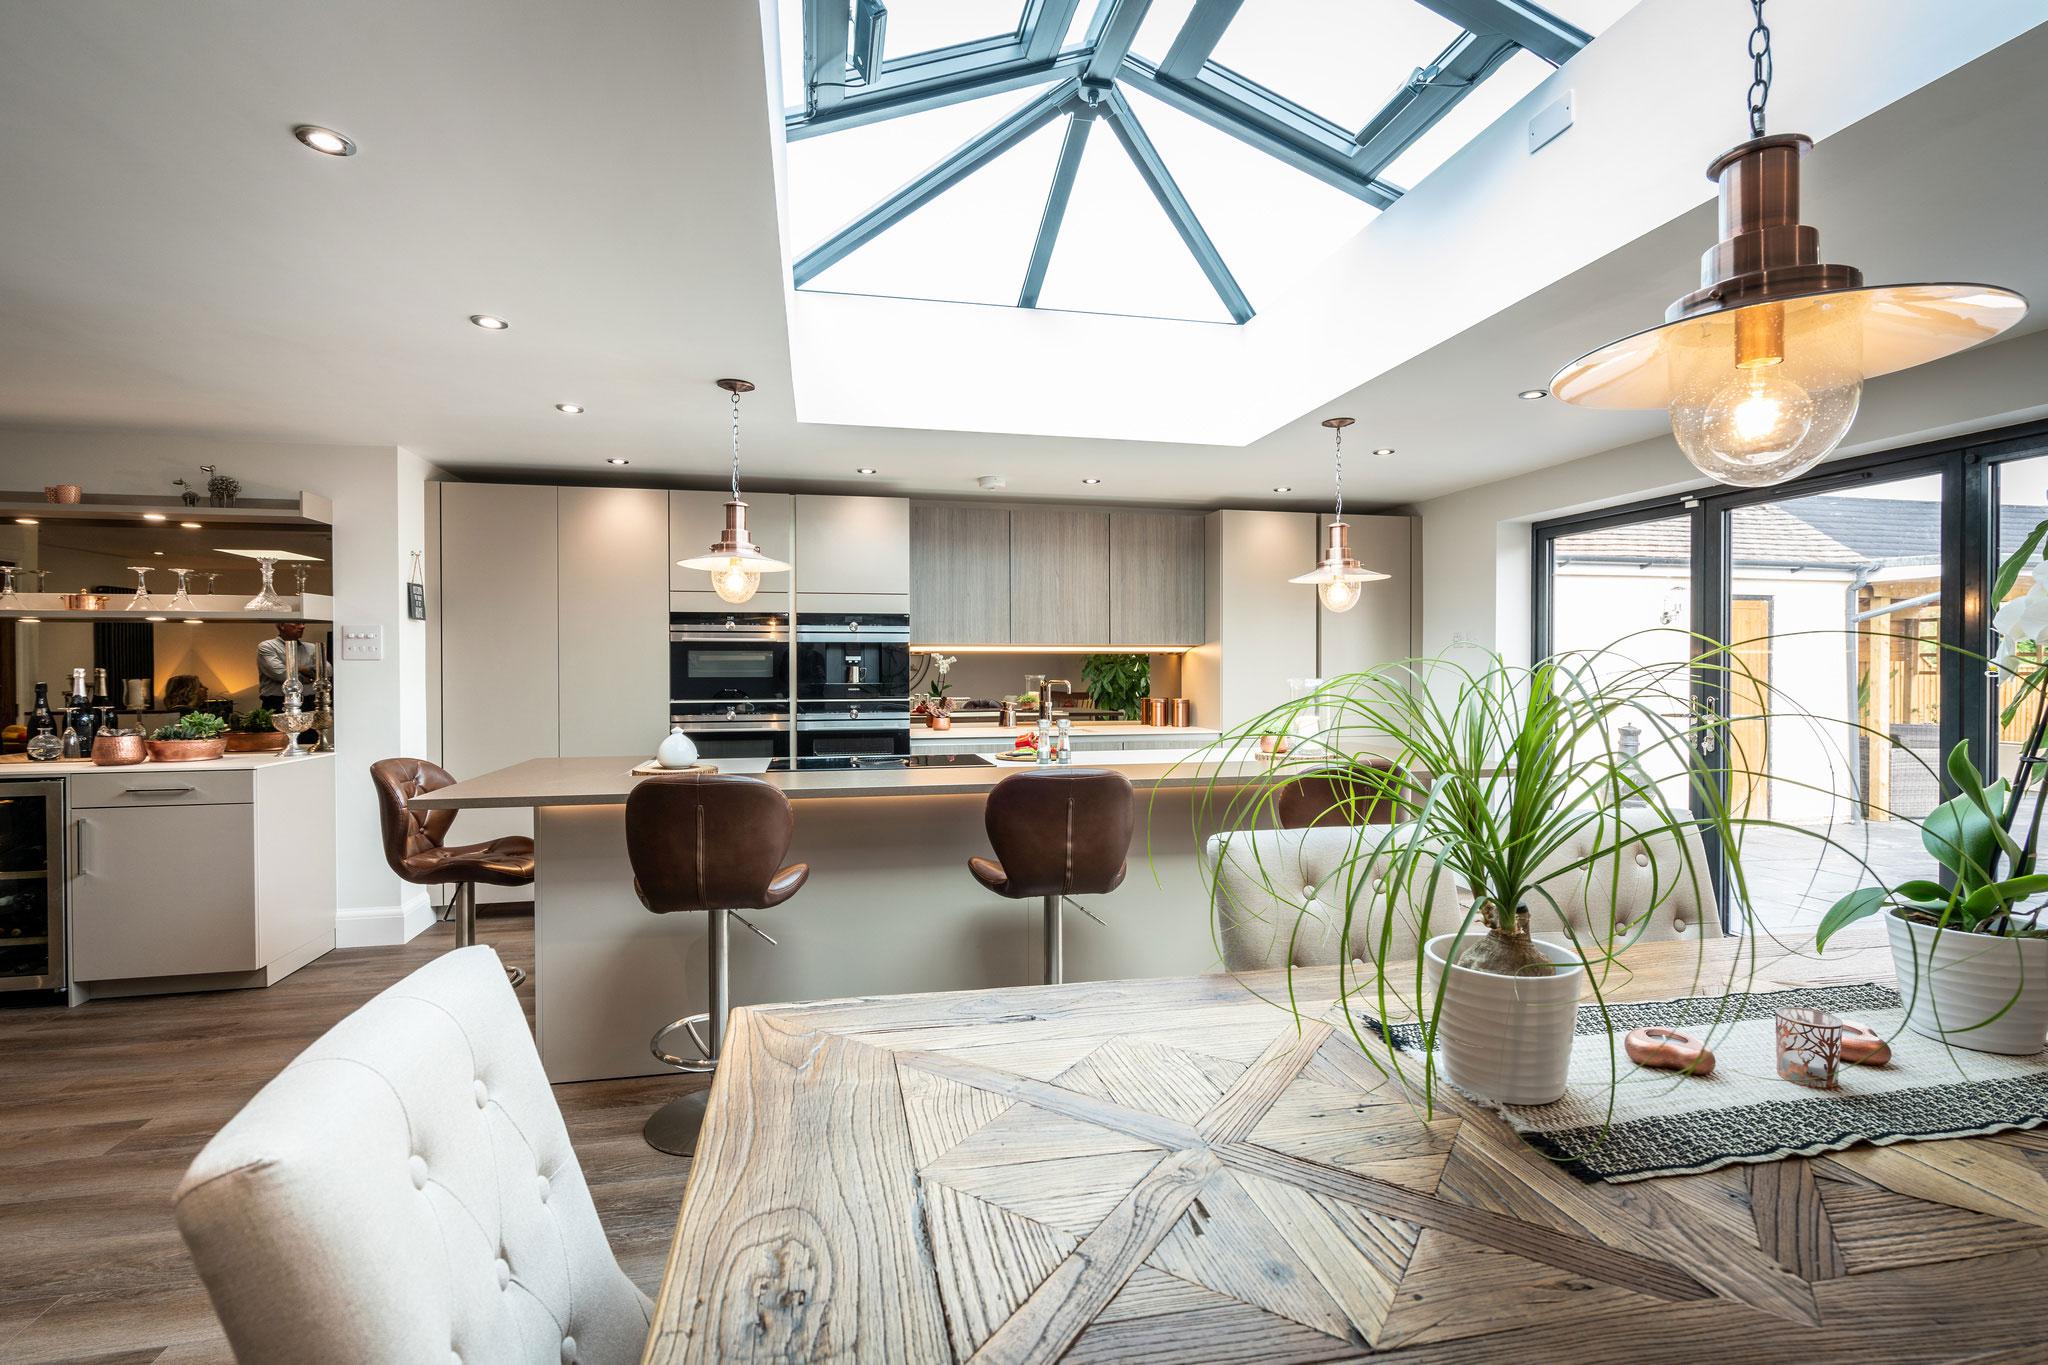 Image of Myers Touch Daniels Kitchen 01020 ZF 2442 14358 1 030 in Een ruimte ontworpen om te socializen - Cosentino